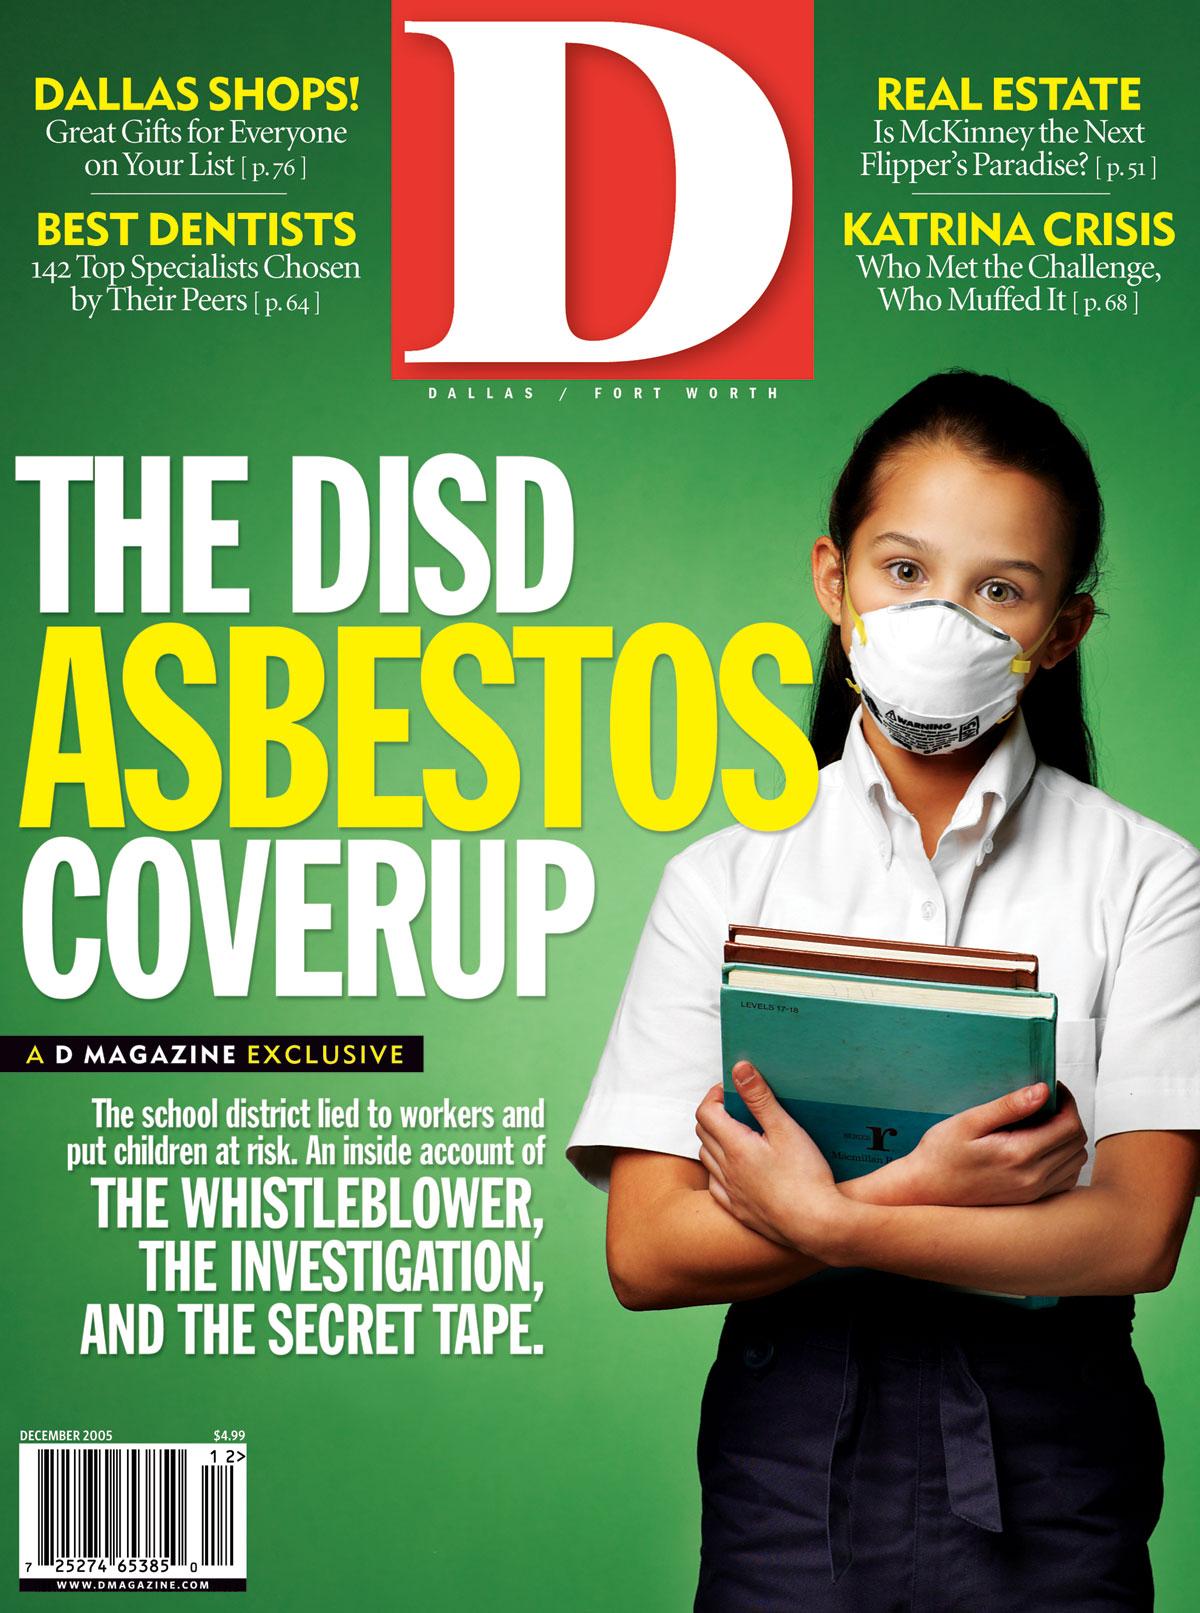 December 2005 cover